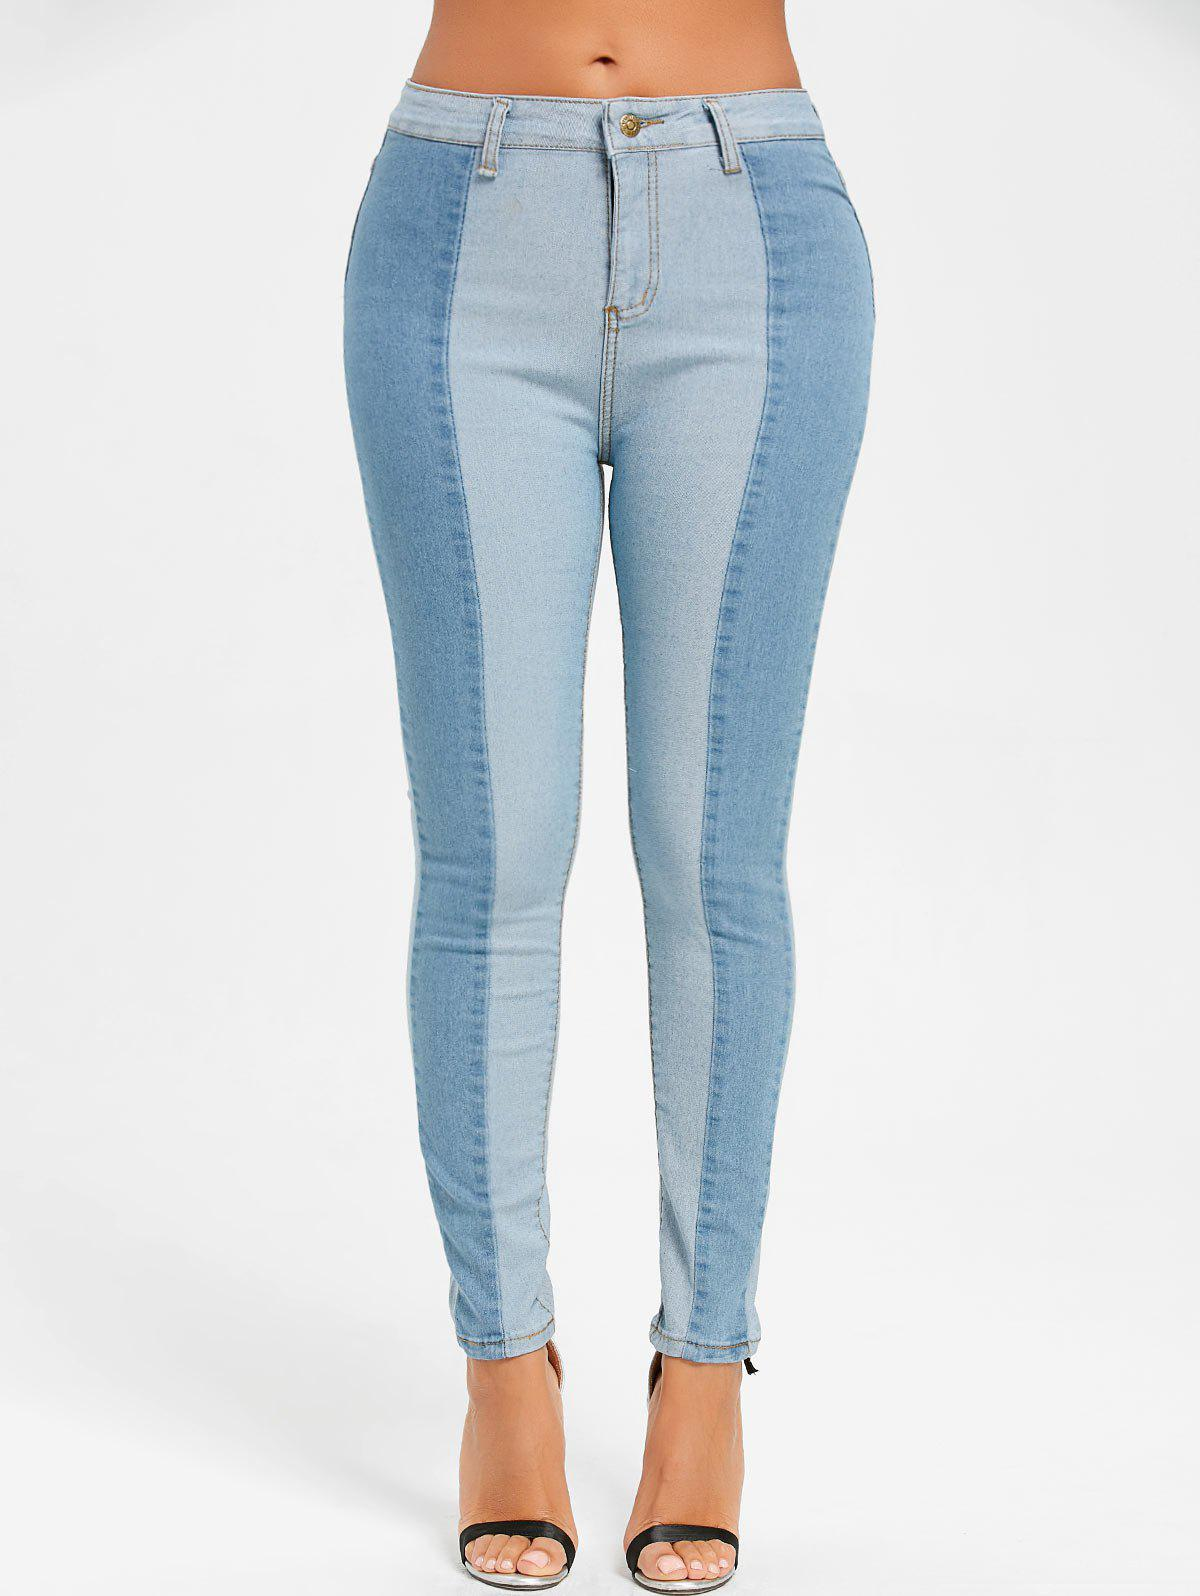 Two Tone Color Denim Jeans 232084904